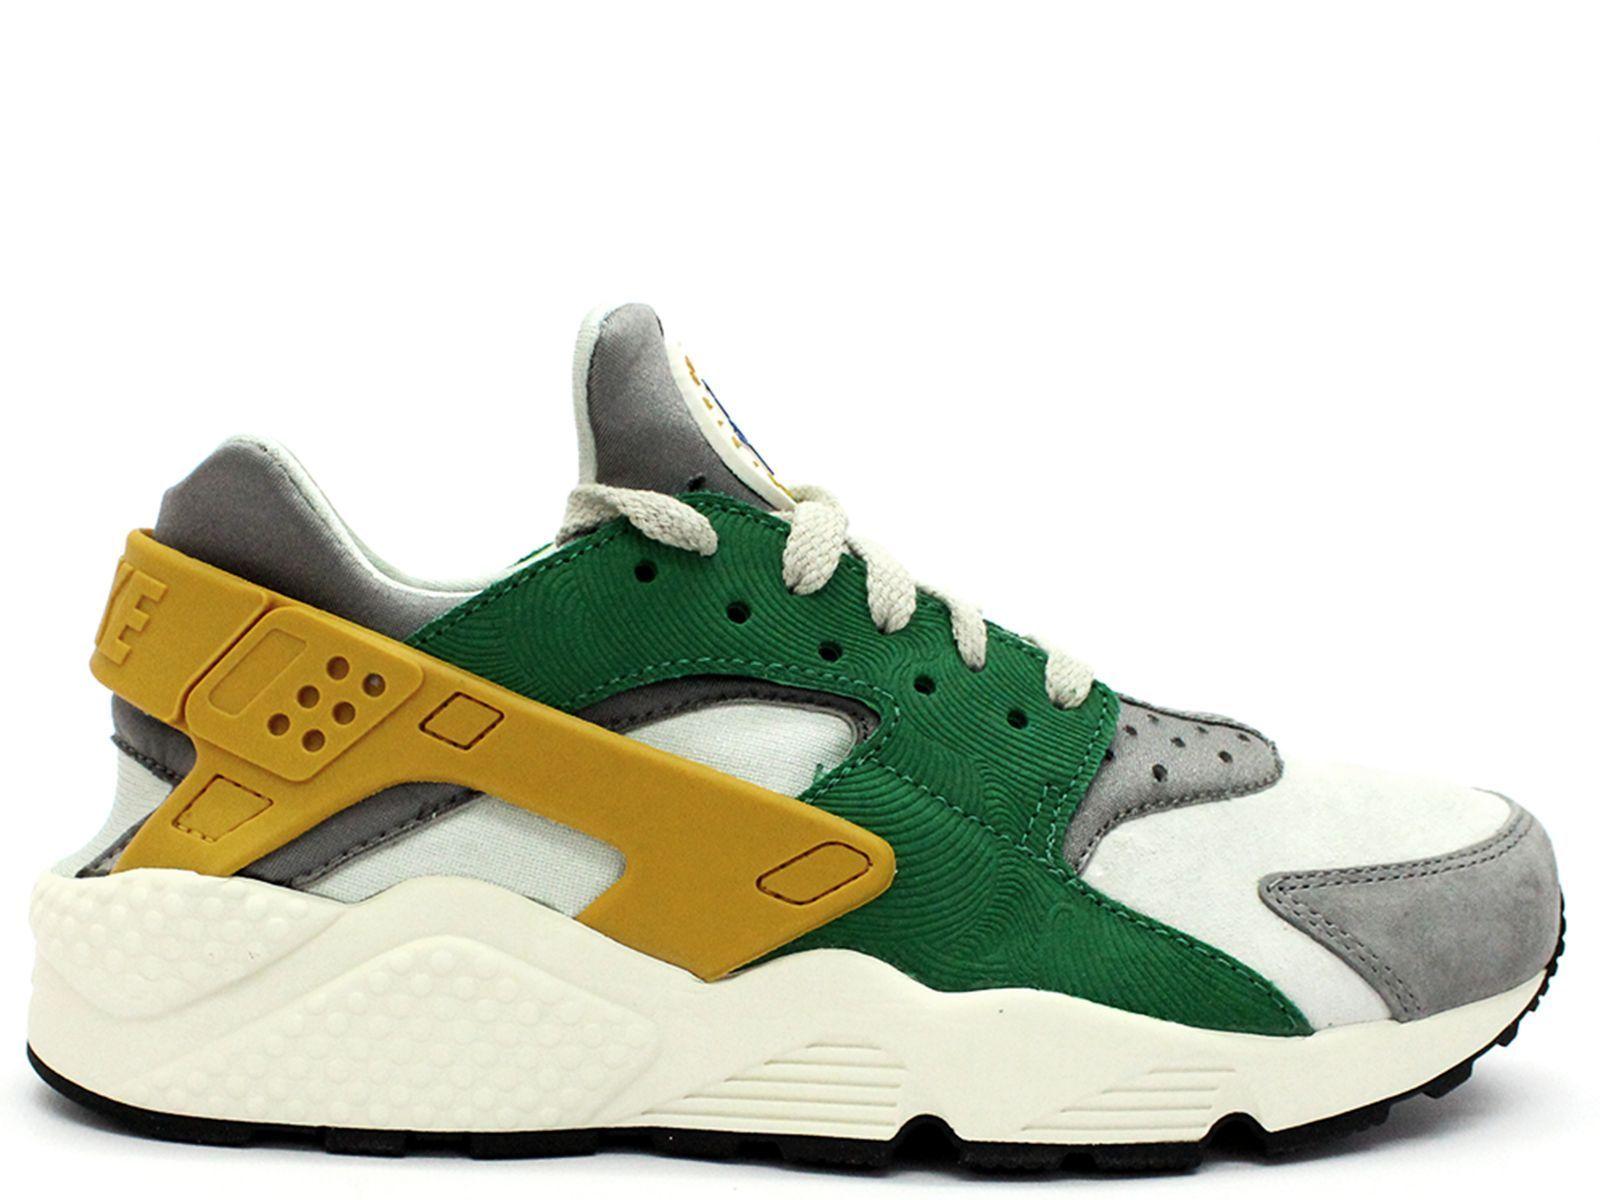 09cc24826ffb Brand New Nike Air Huarache Run SES Men s Athletic Fashion Sneakers  852628  300